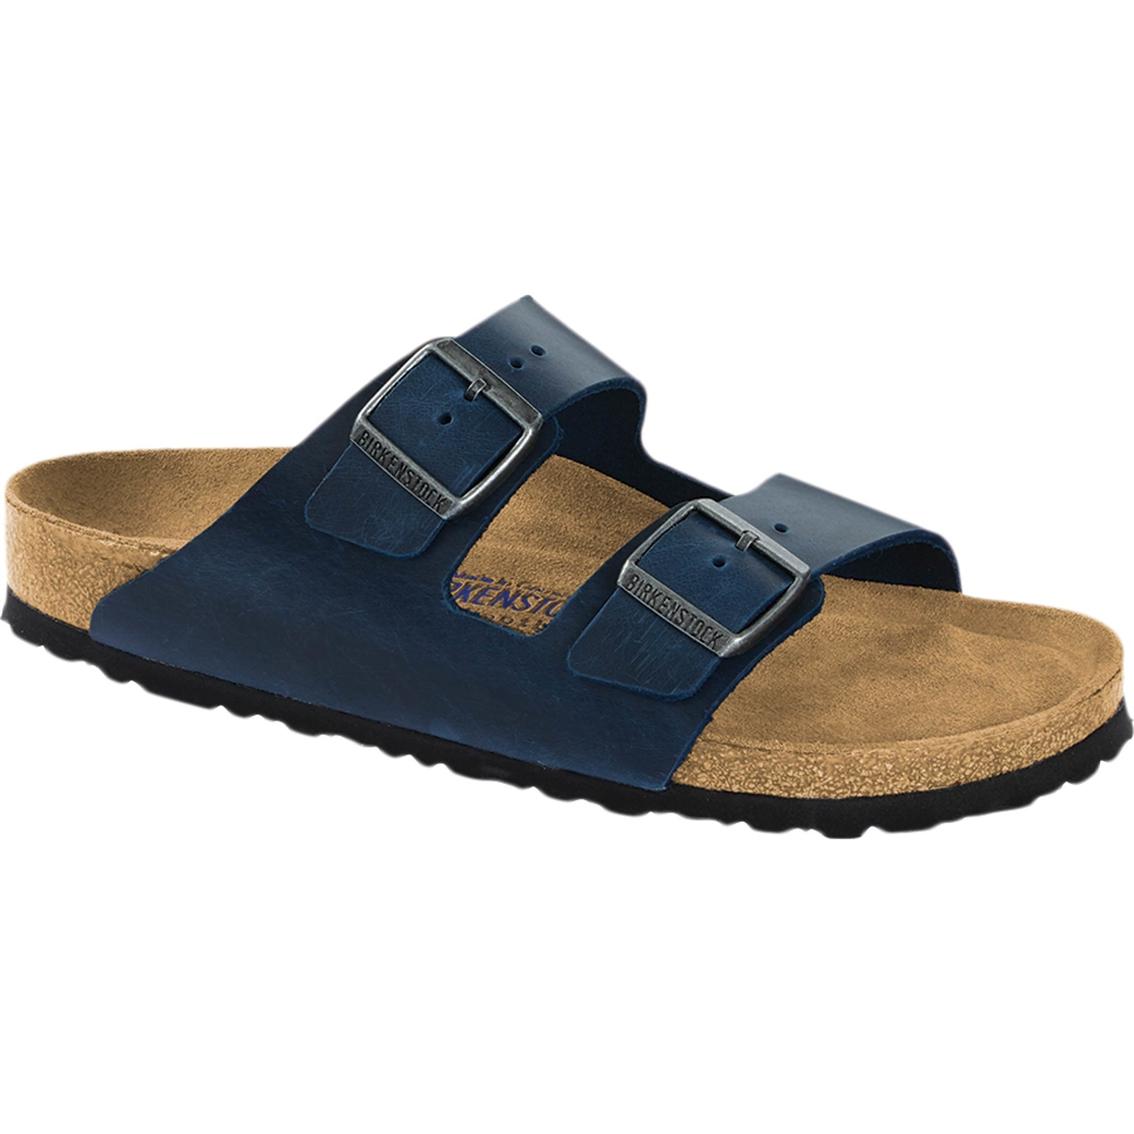 Birkenstock Women S Arizona Oiled Sandals Flats Shoes Shop The